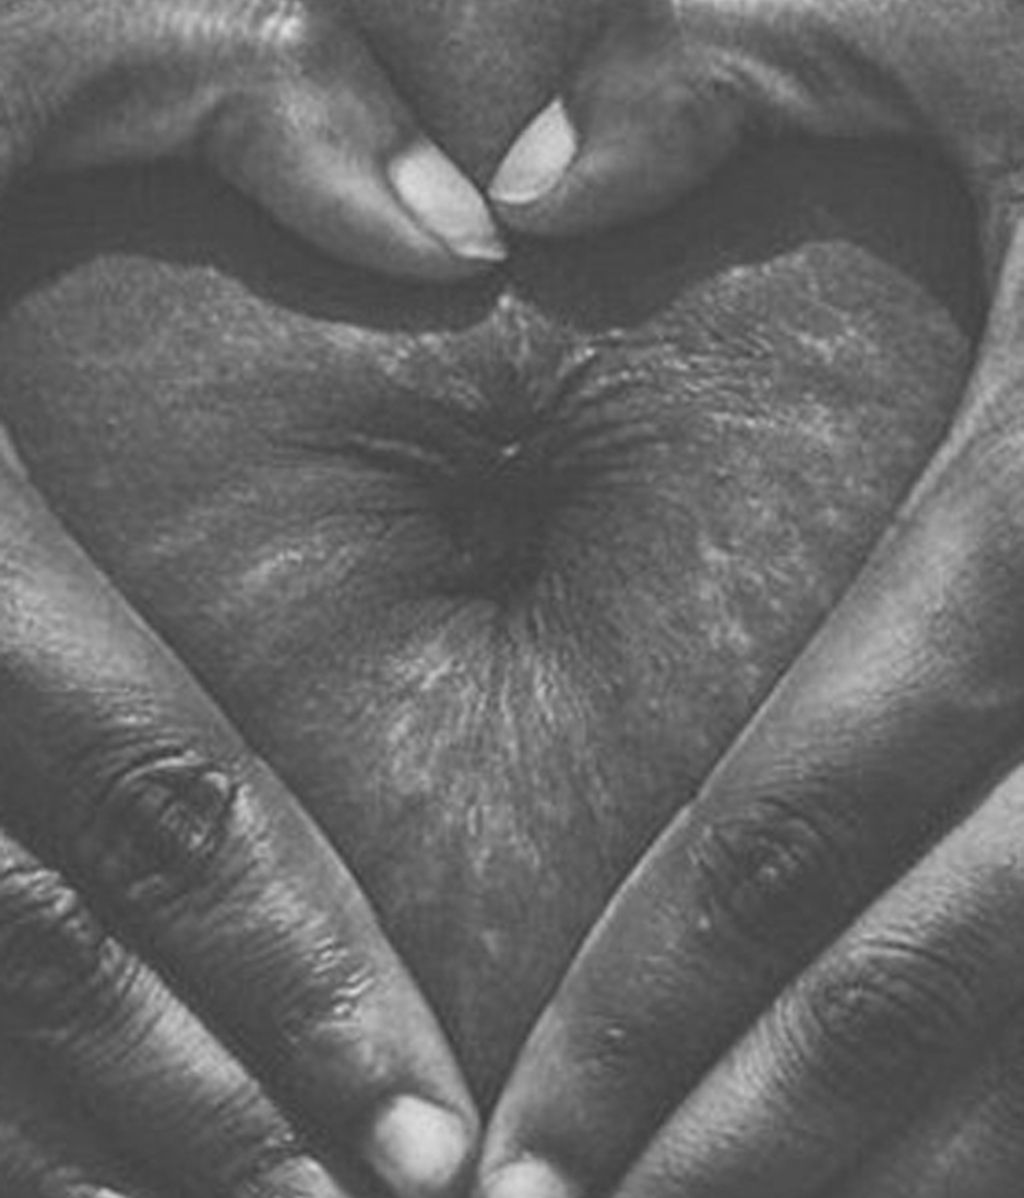 'Love your lines' una iniciativa viral lejos de retoques